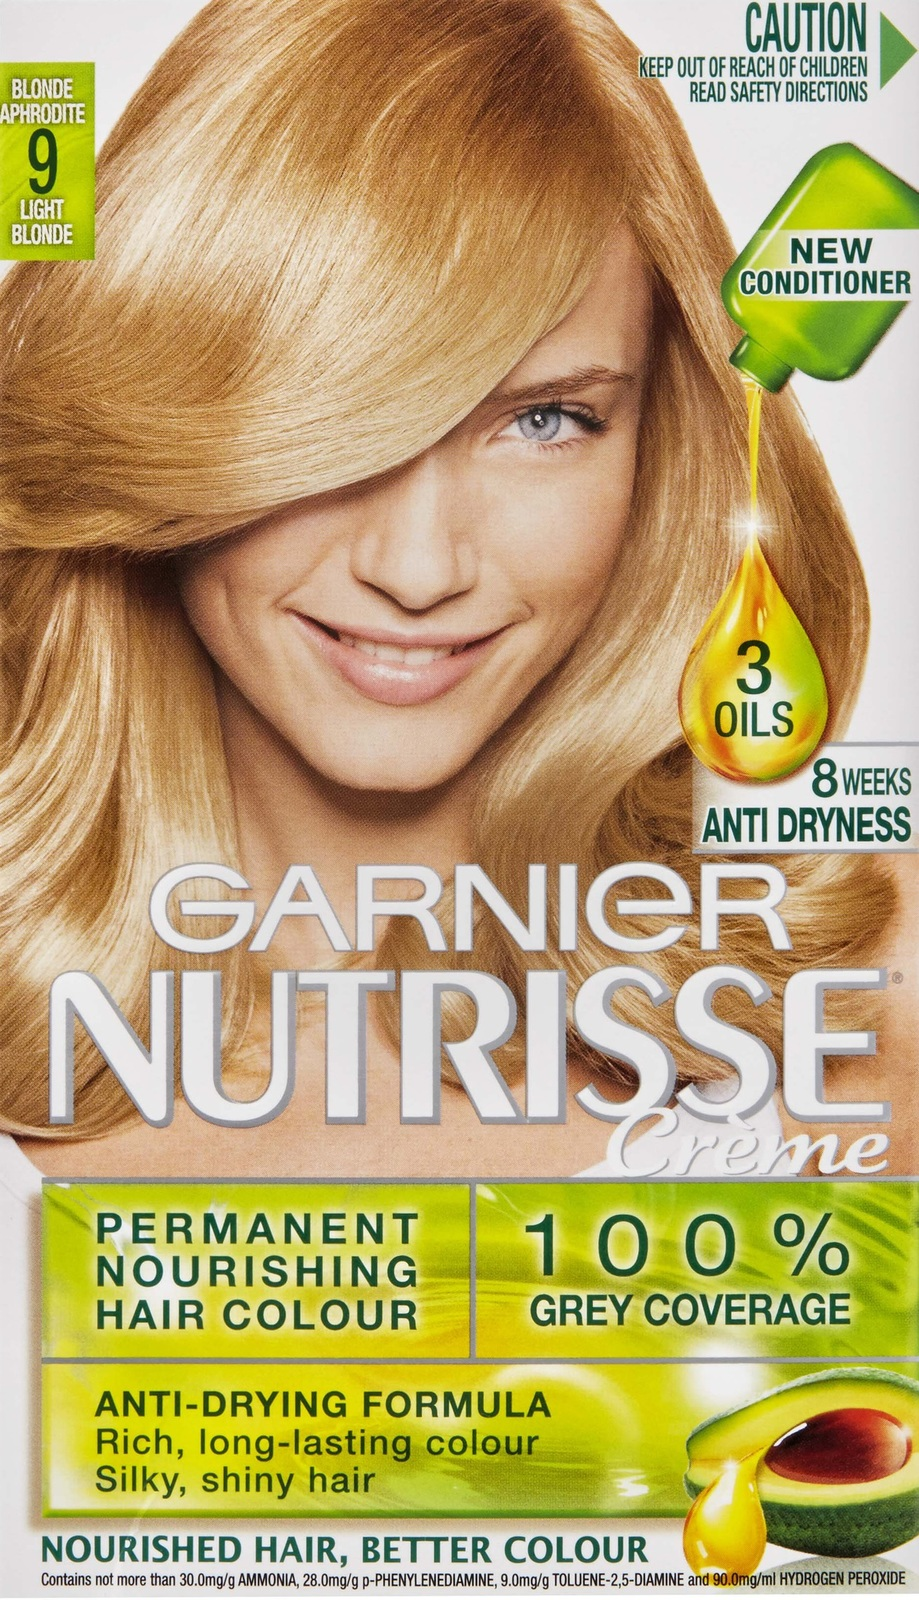 Buy Garnier Nutrisse Hair Colour 90 Blonde Aphrodite At Mighty Ape Nz